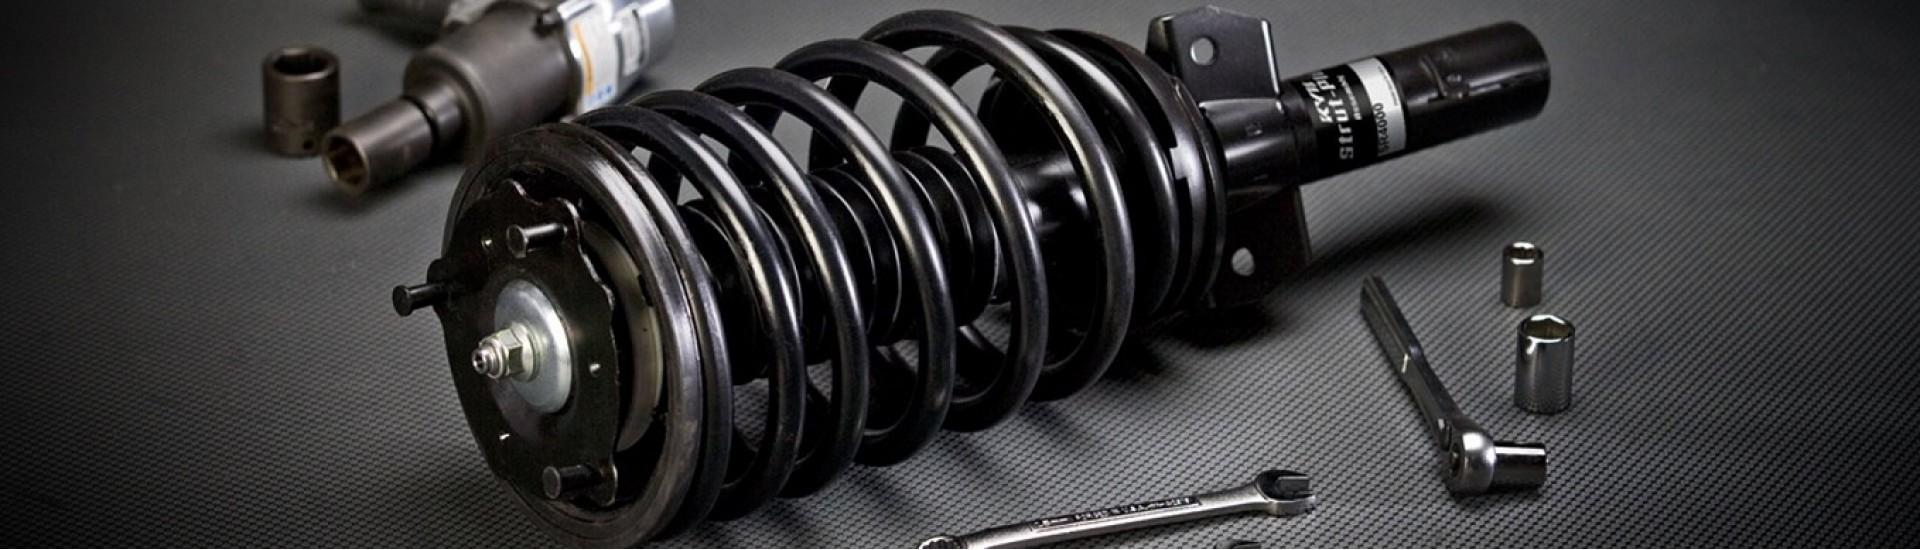 قطعات جلوبندی ، لوازم جلوبندی ، suspension parts